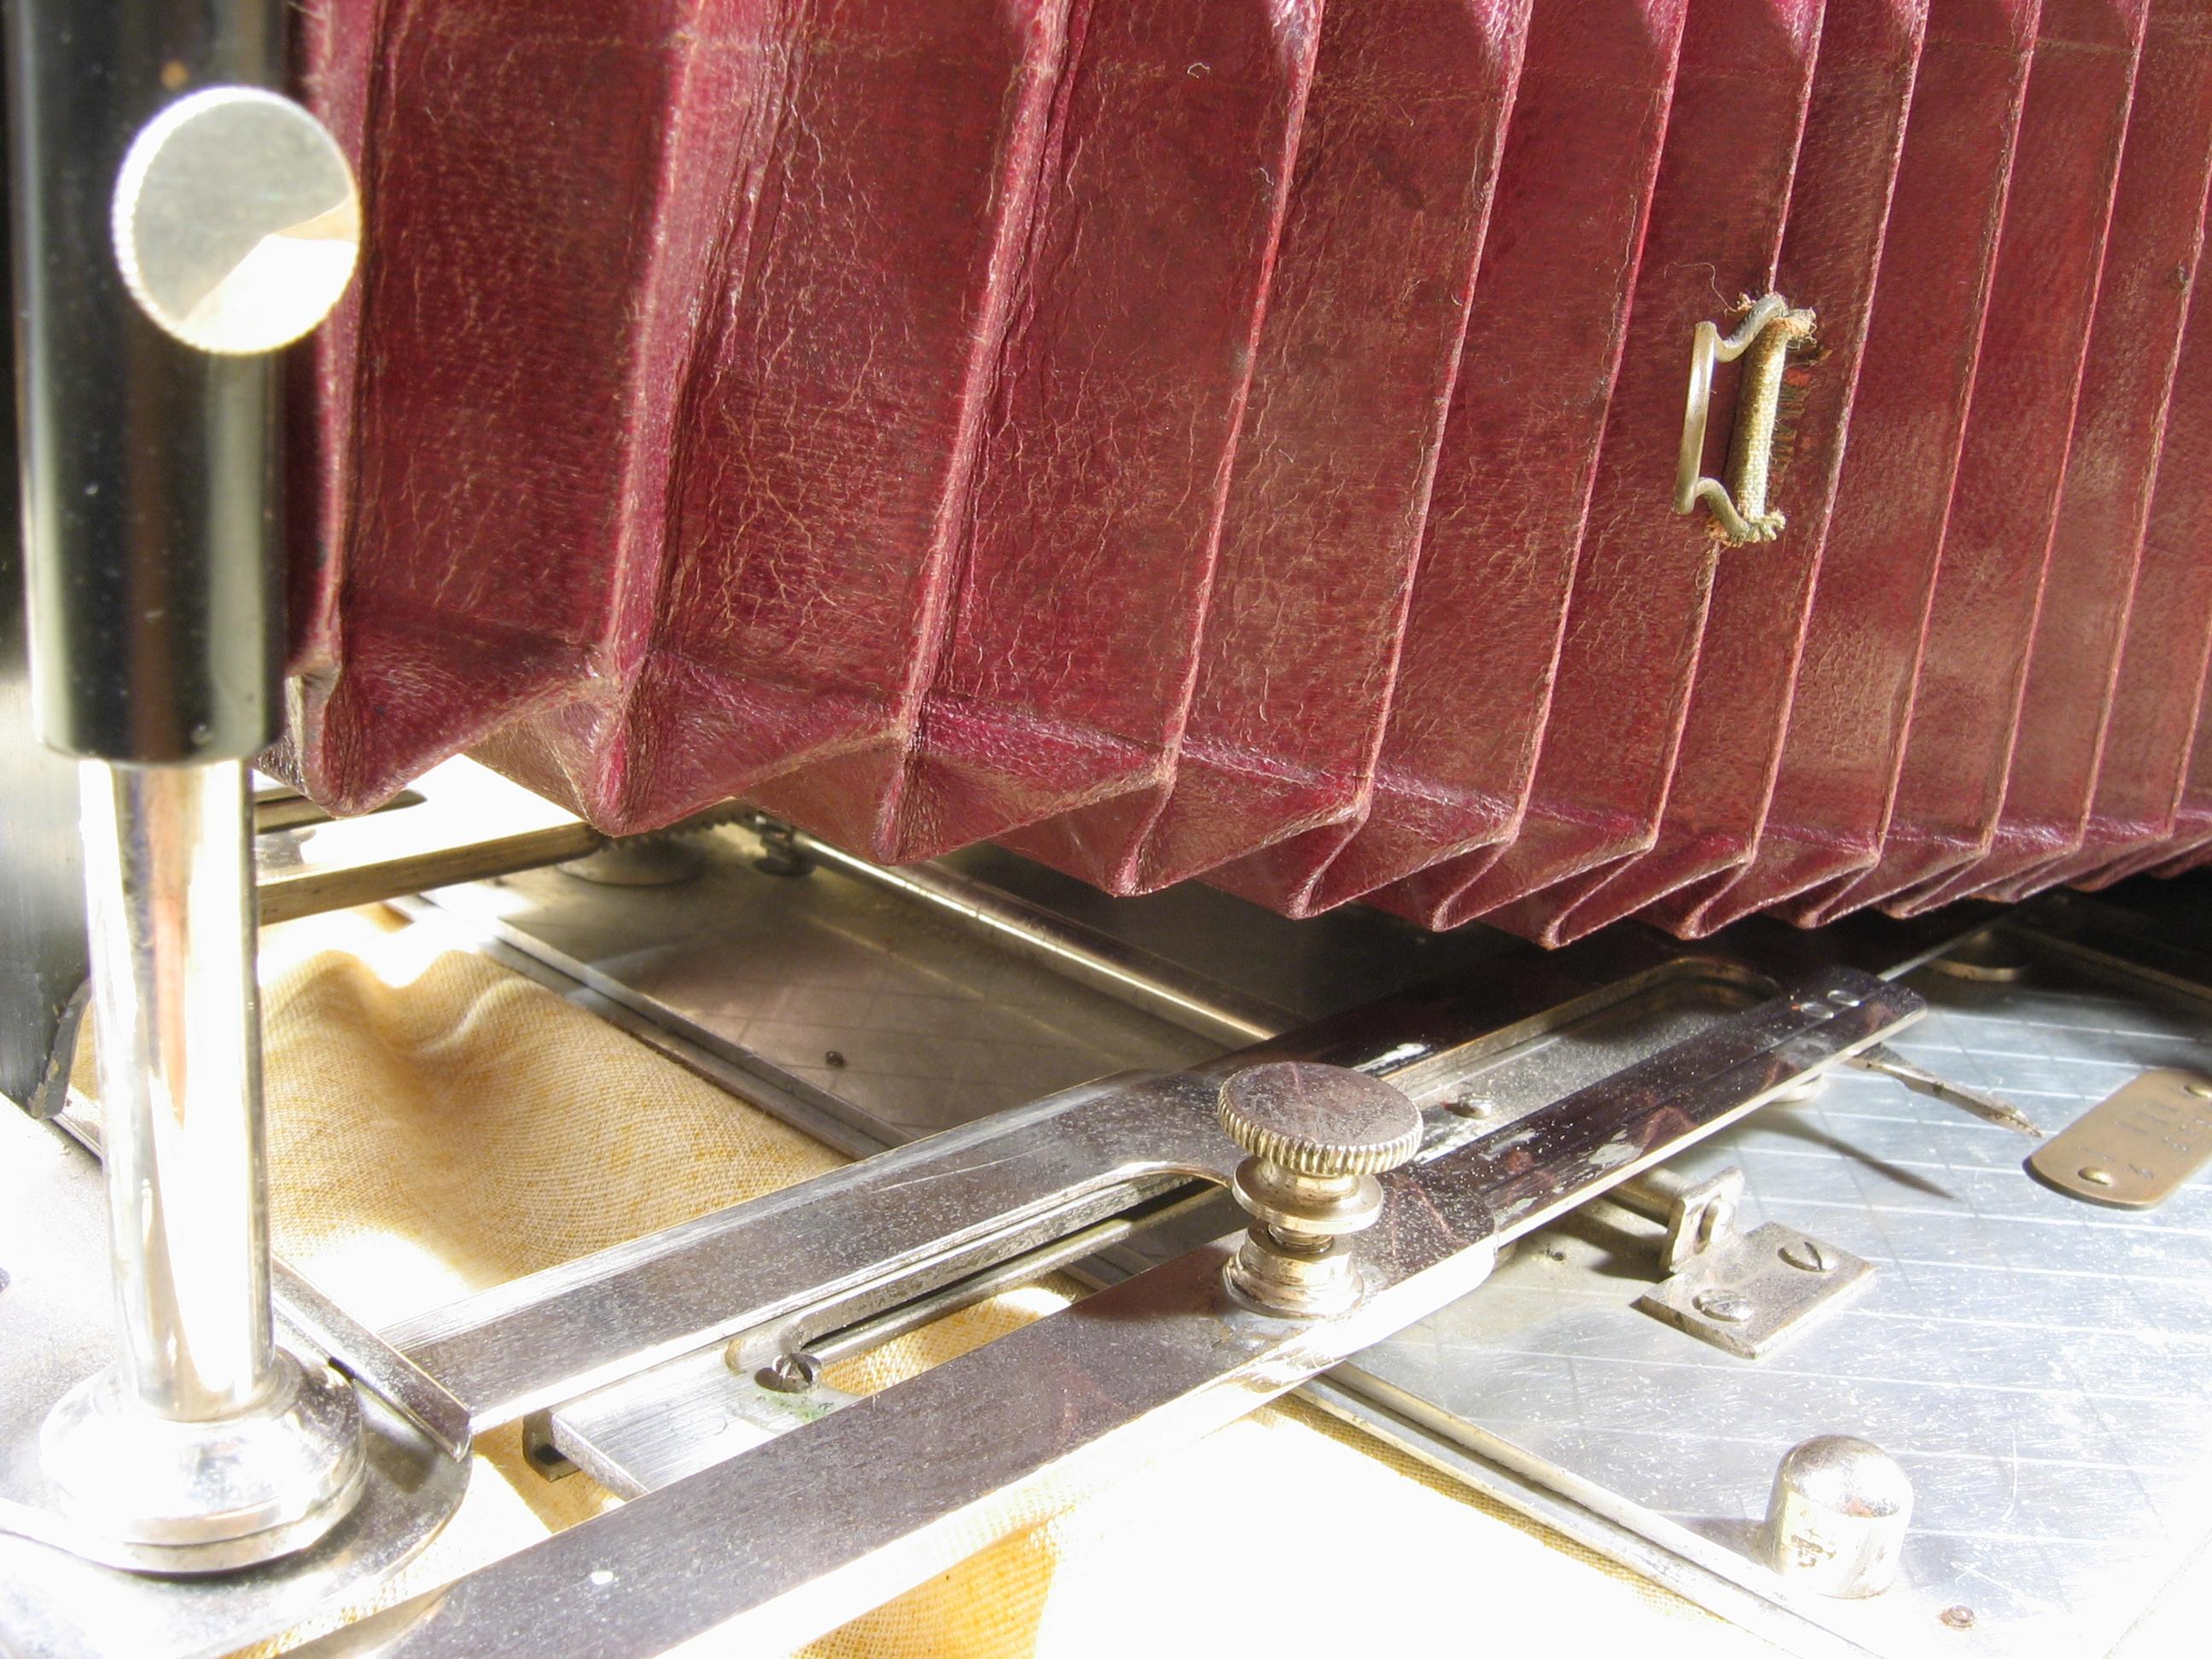 Wallpaper Appareils photos 1226-9  JONTE  F  Chambre folding tropicale 13X18, collection AMI